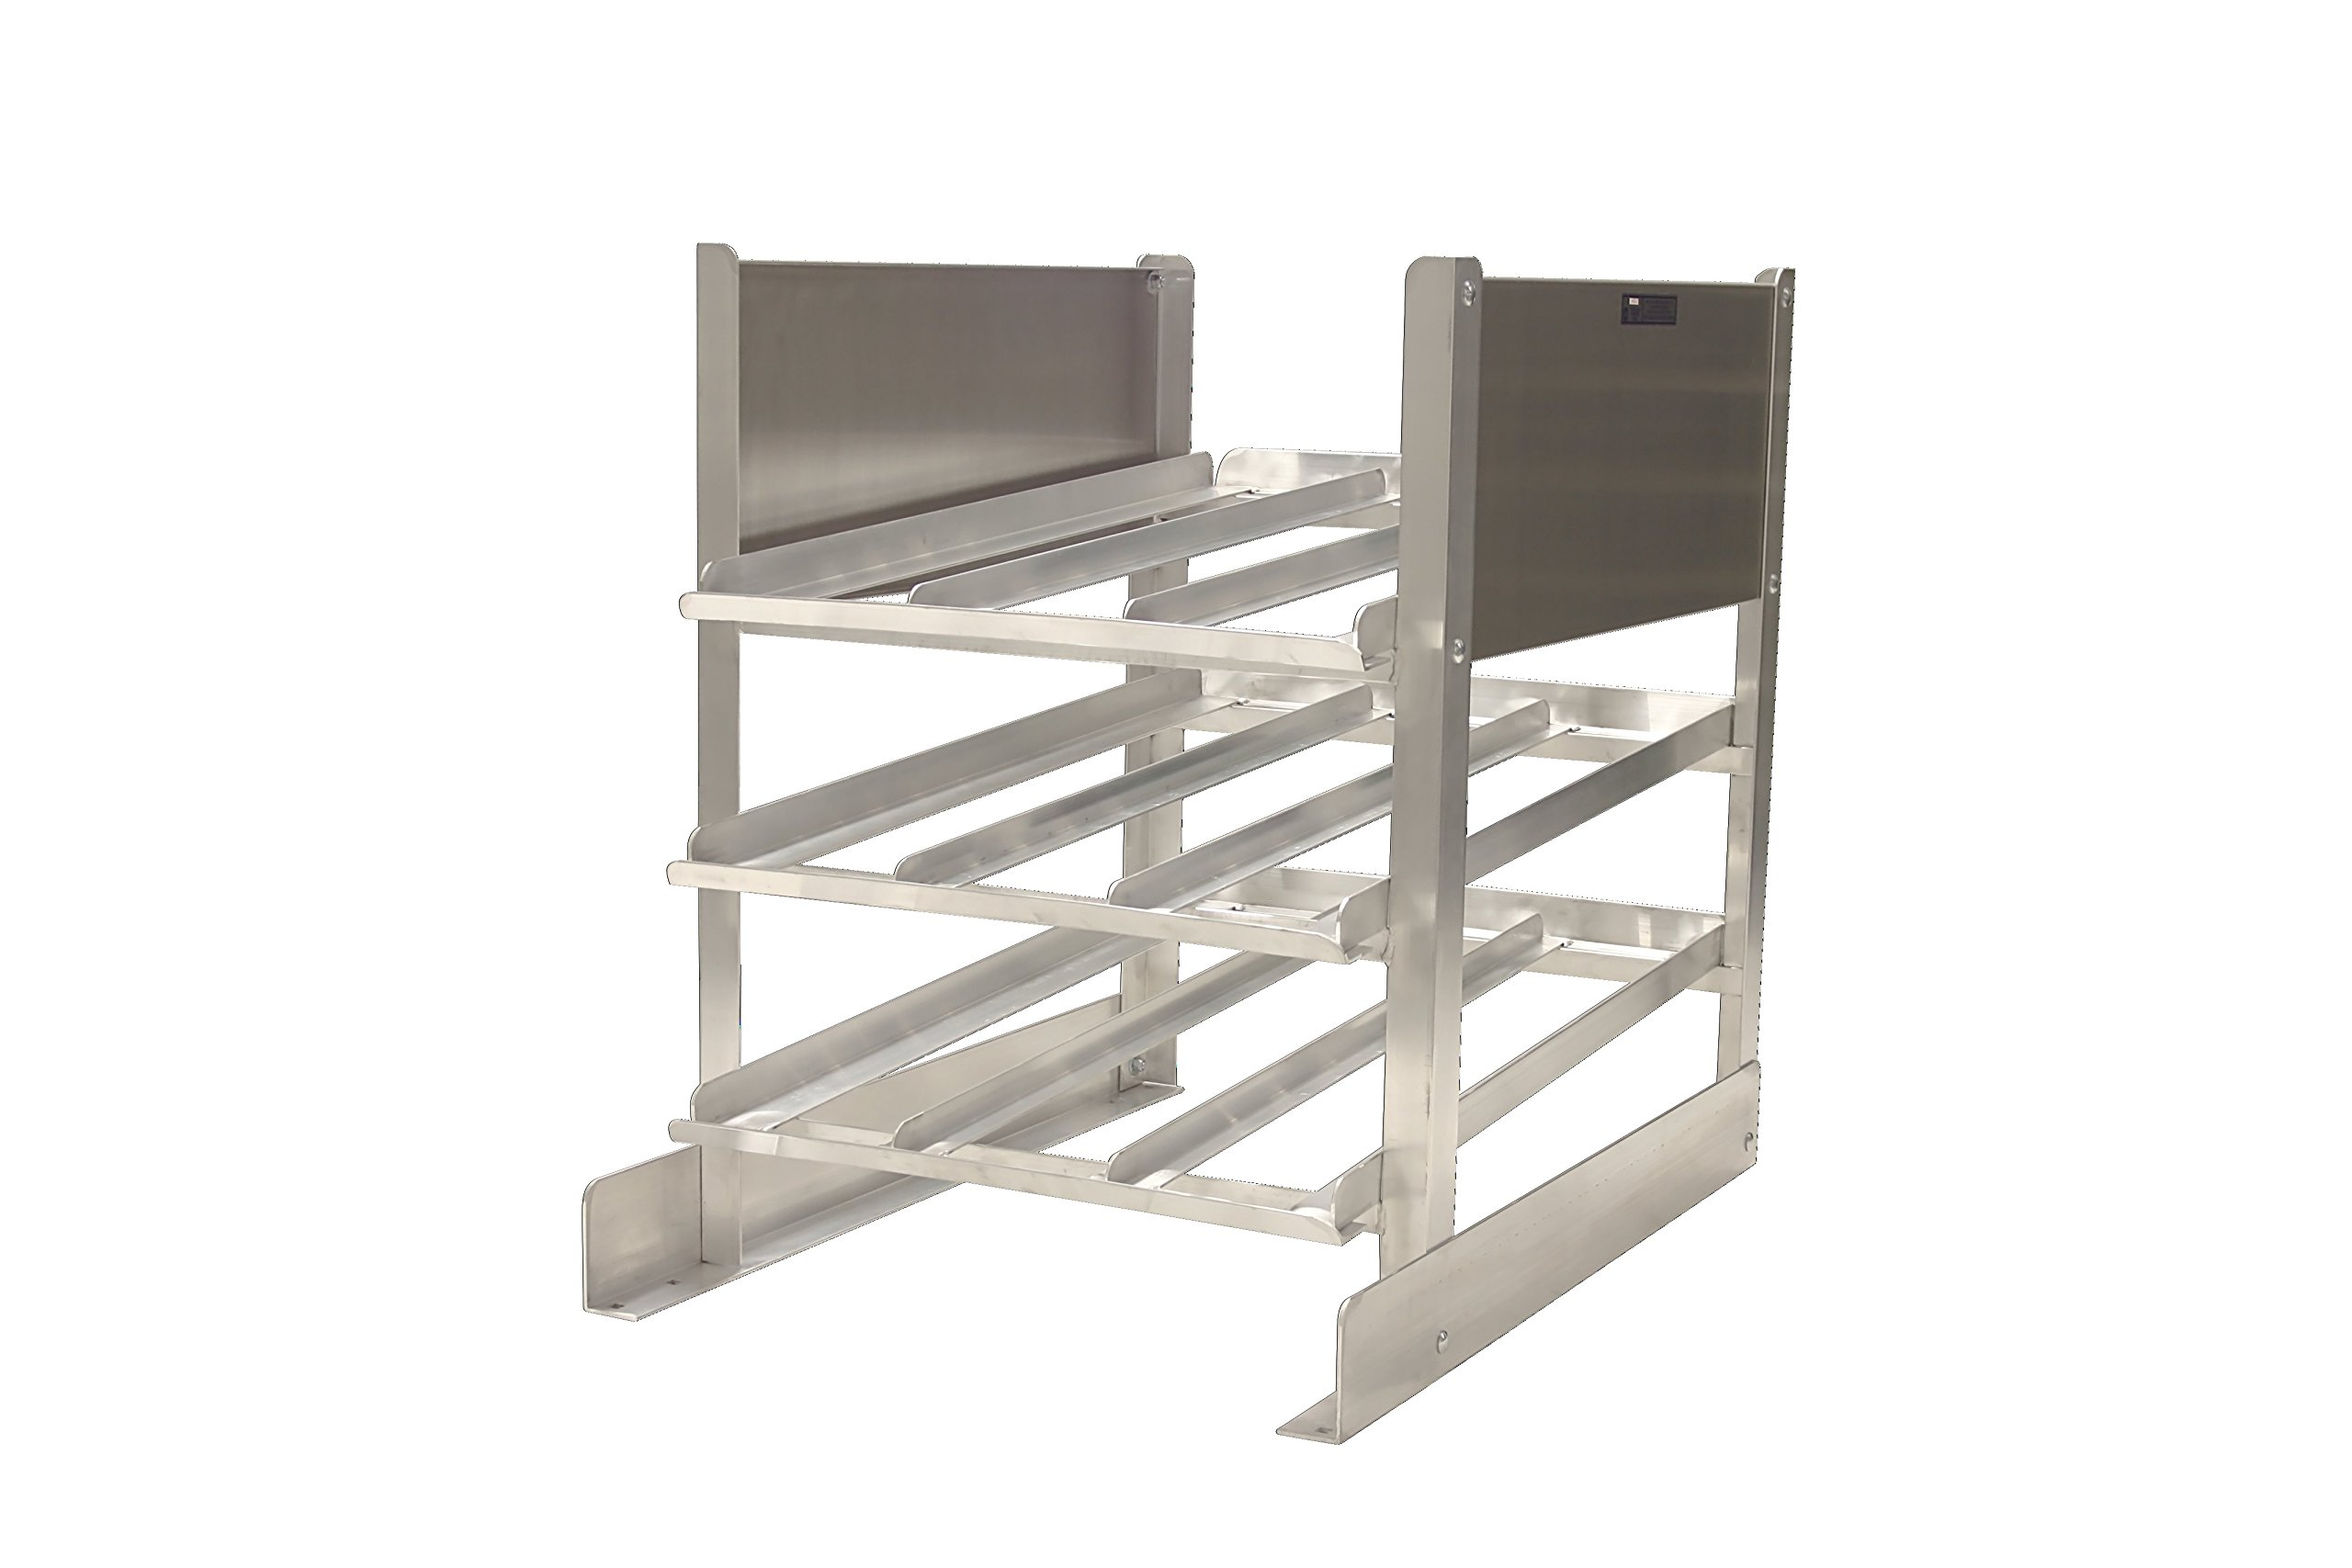 PVIFS CR0540 Stationary Half Size Can Rack, 36'' Length x 25'' Width x 32'' Height by PVIFS